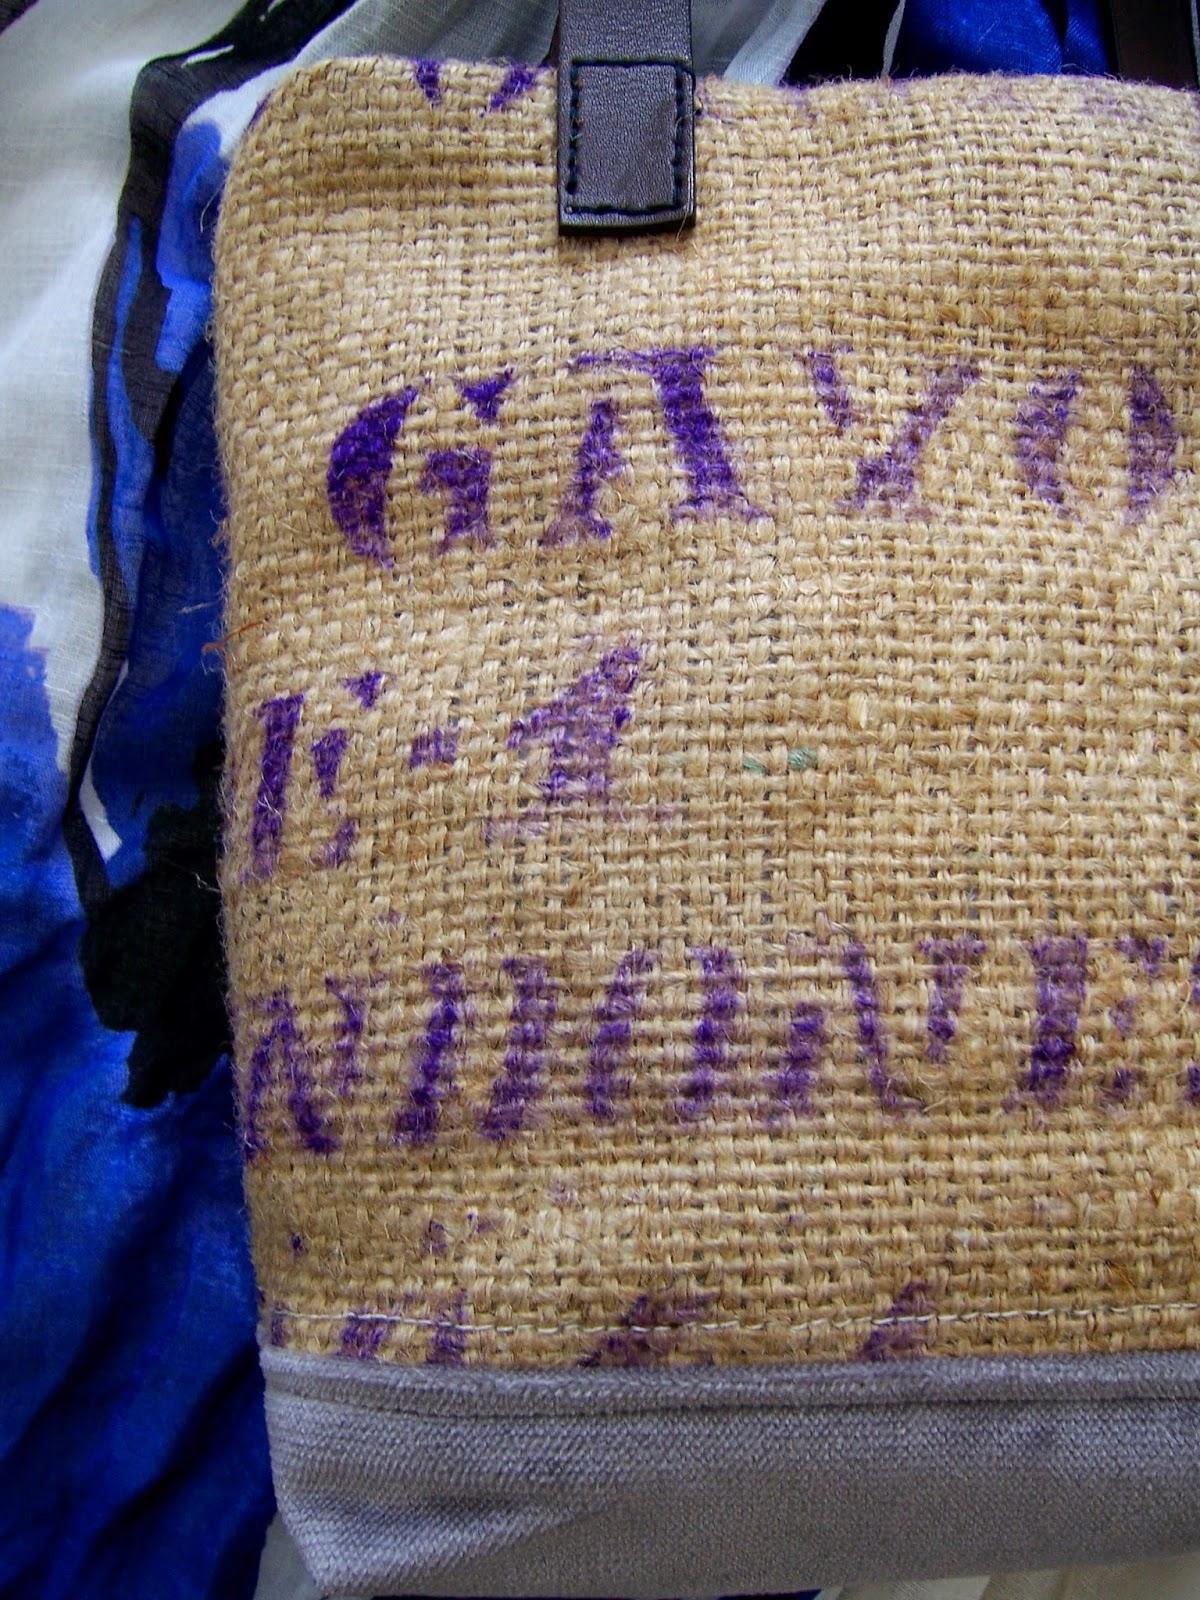 Gavo burlap tote bag - exterior detailed - linaandvi.blogspot.com